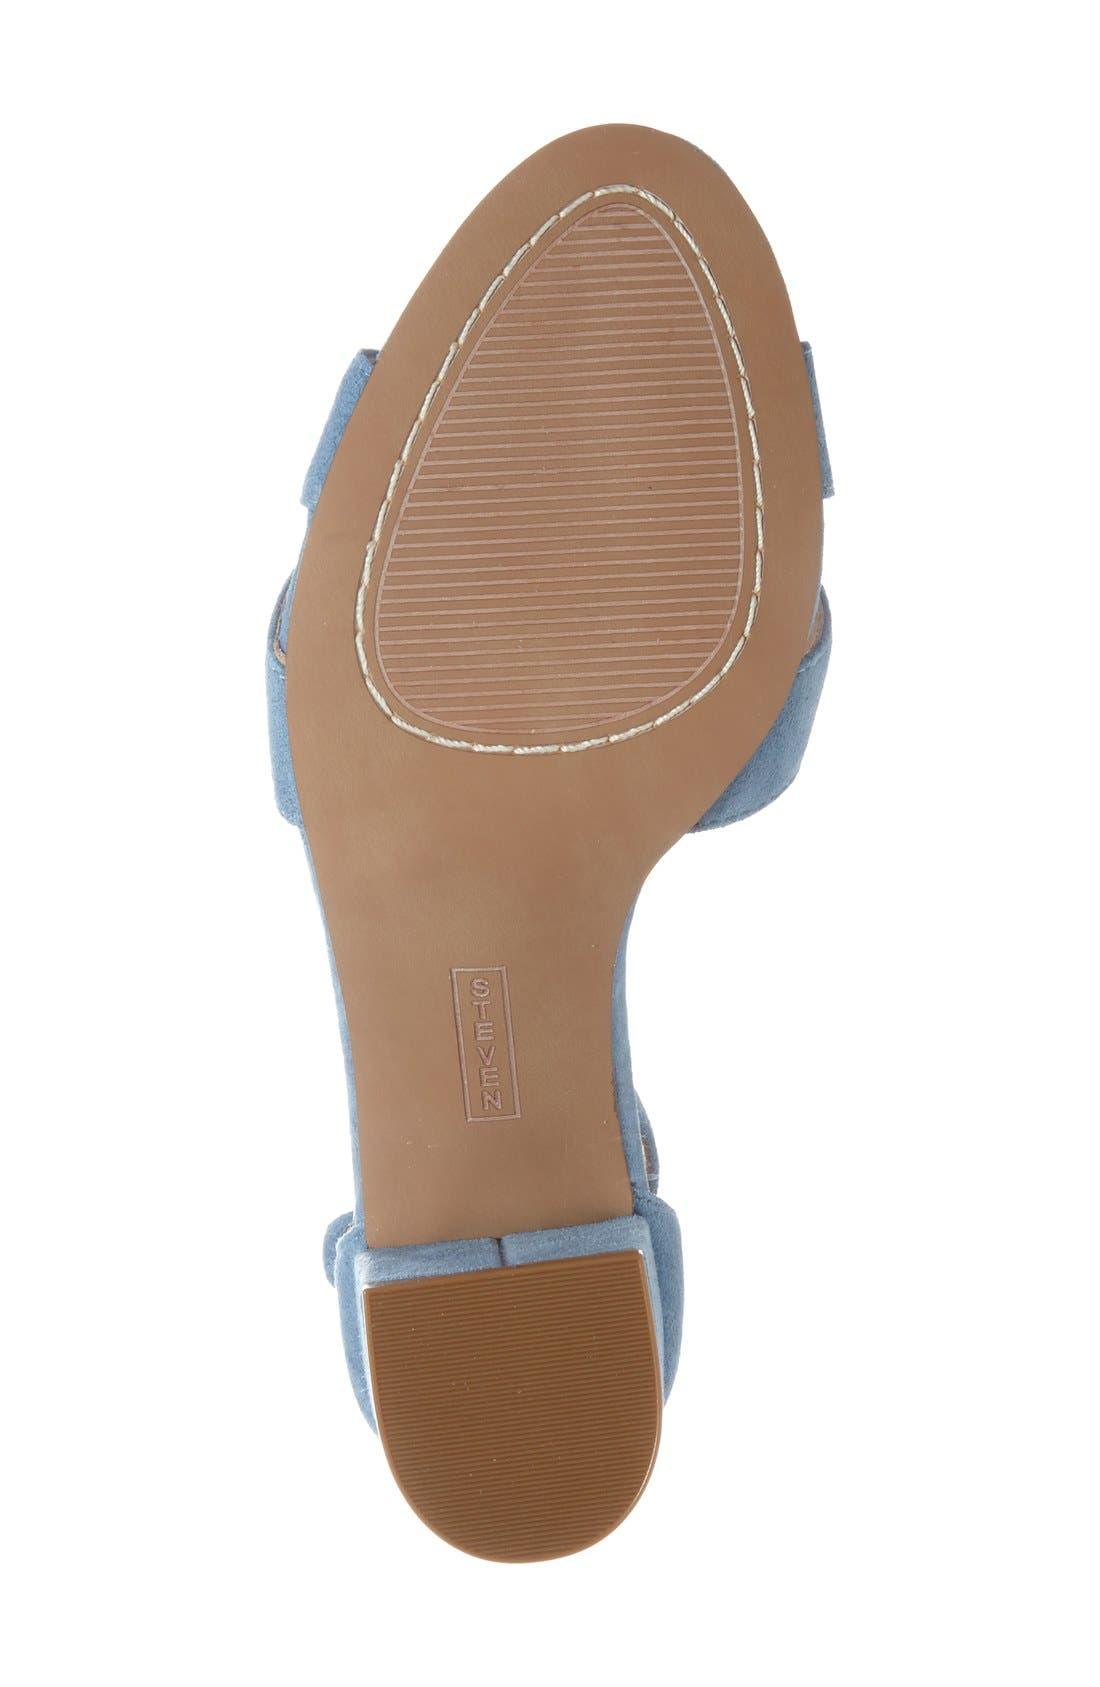 'Voomme' Ankle Strap Sandal,                             Alternate thumbnail 11, color,